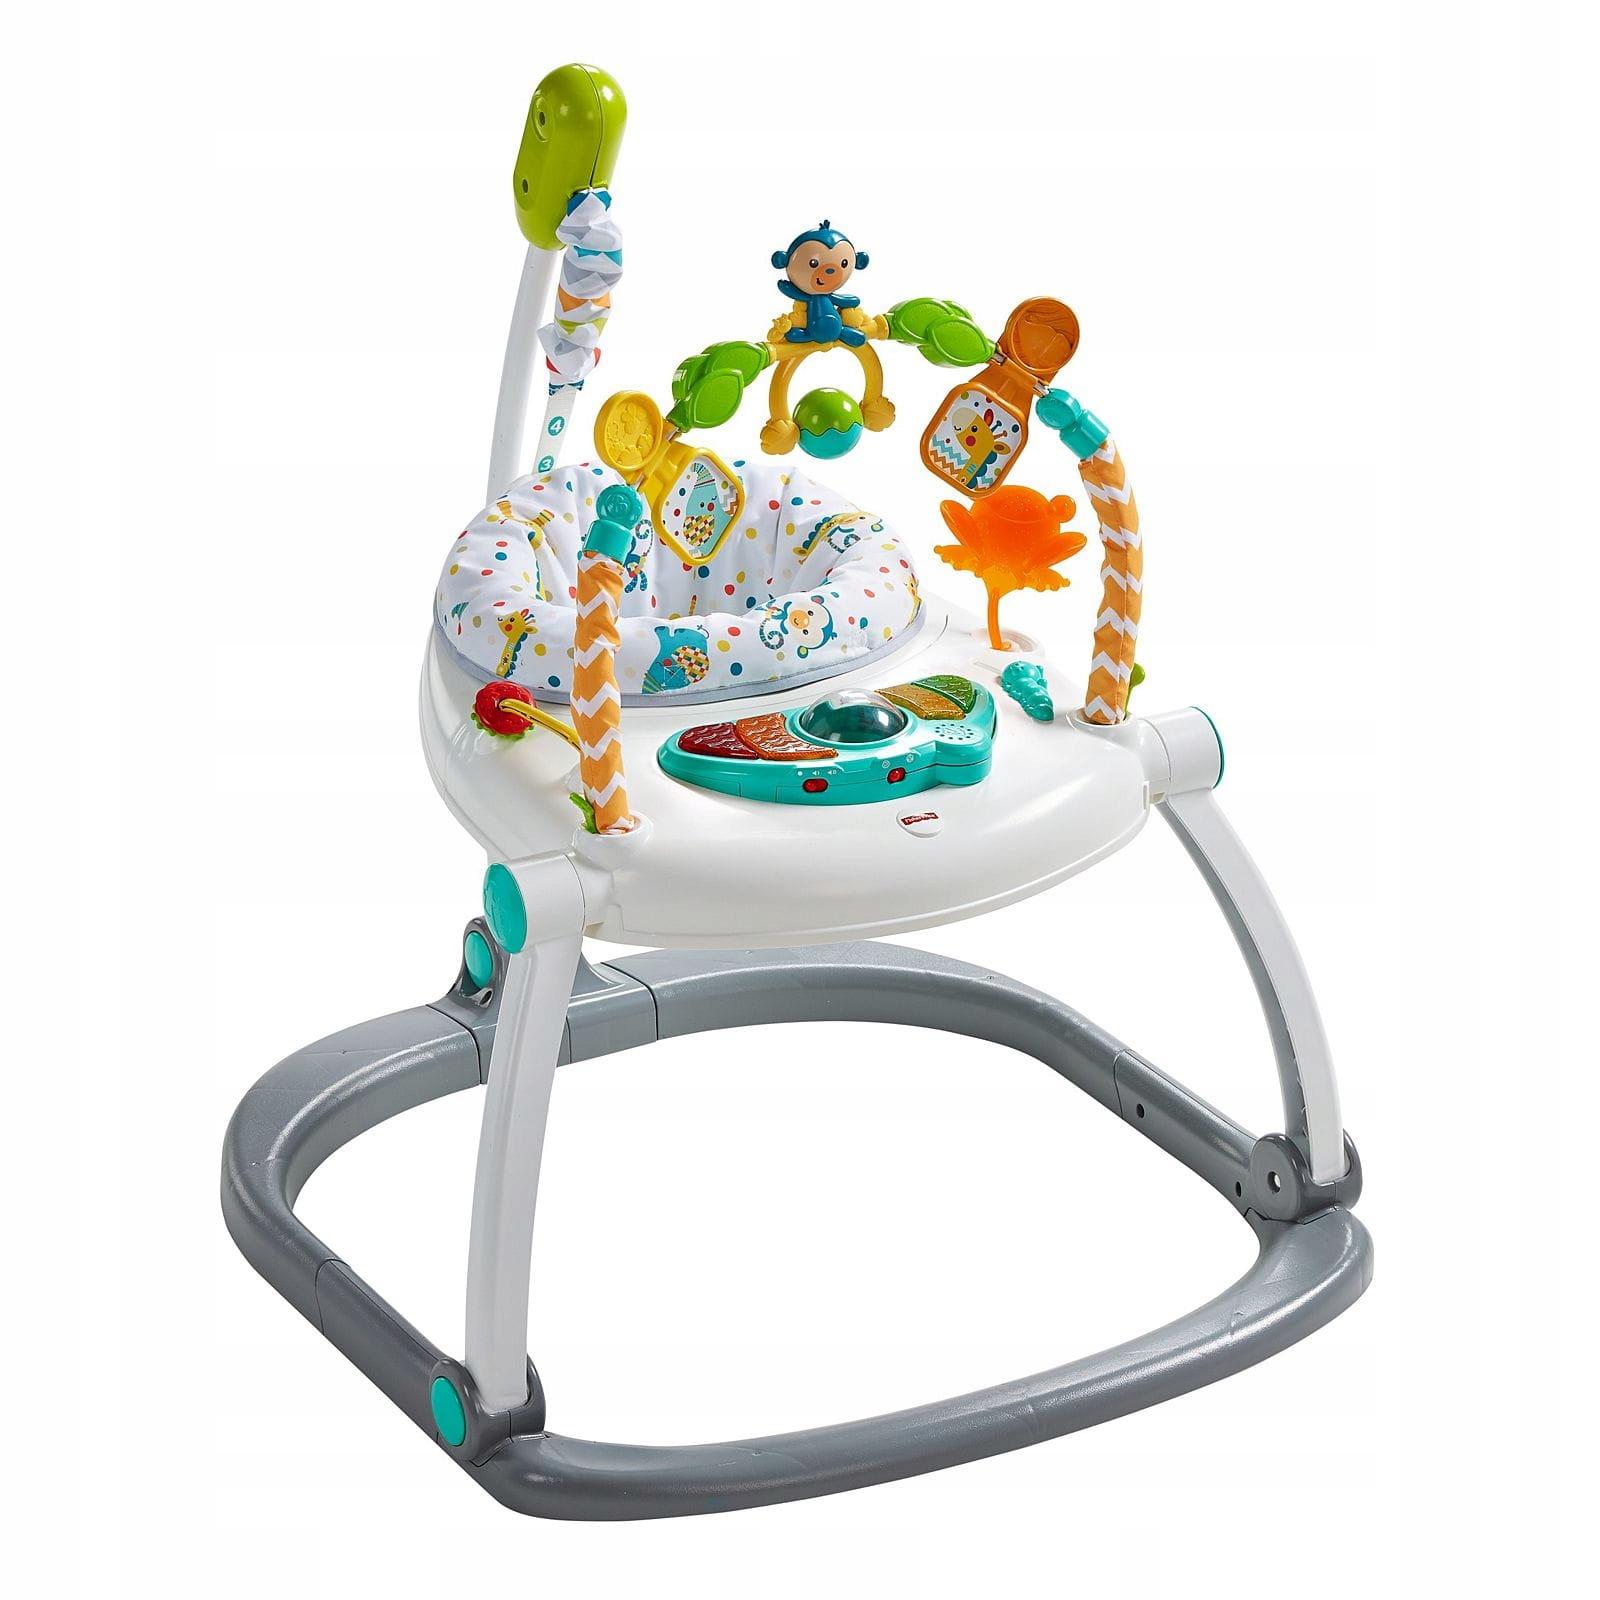 FISHER-PRICE Interaktívny jumper pre deti.